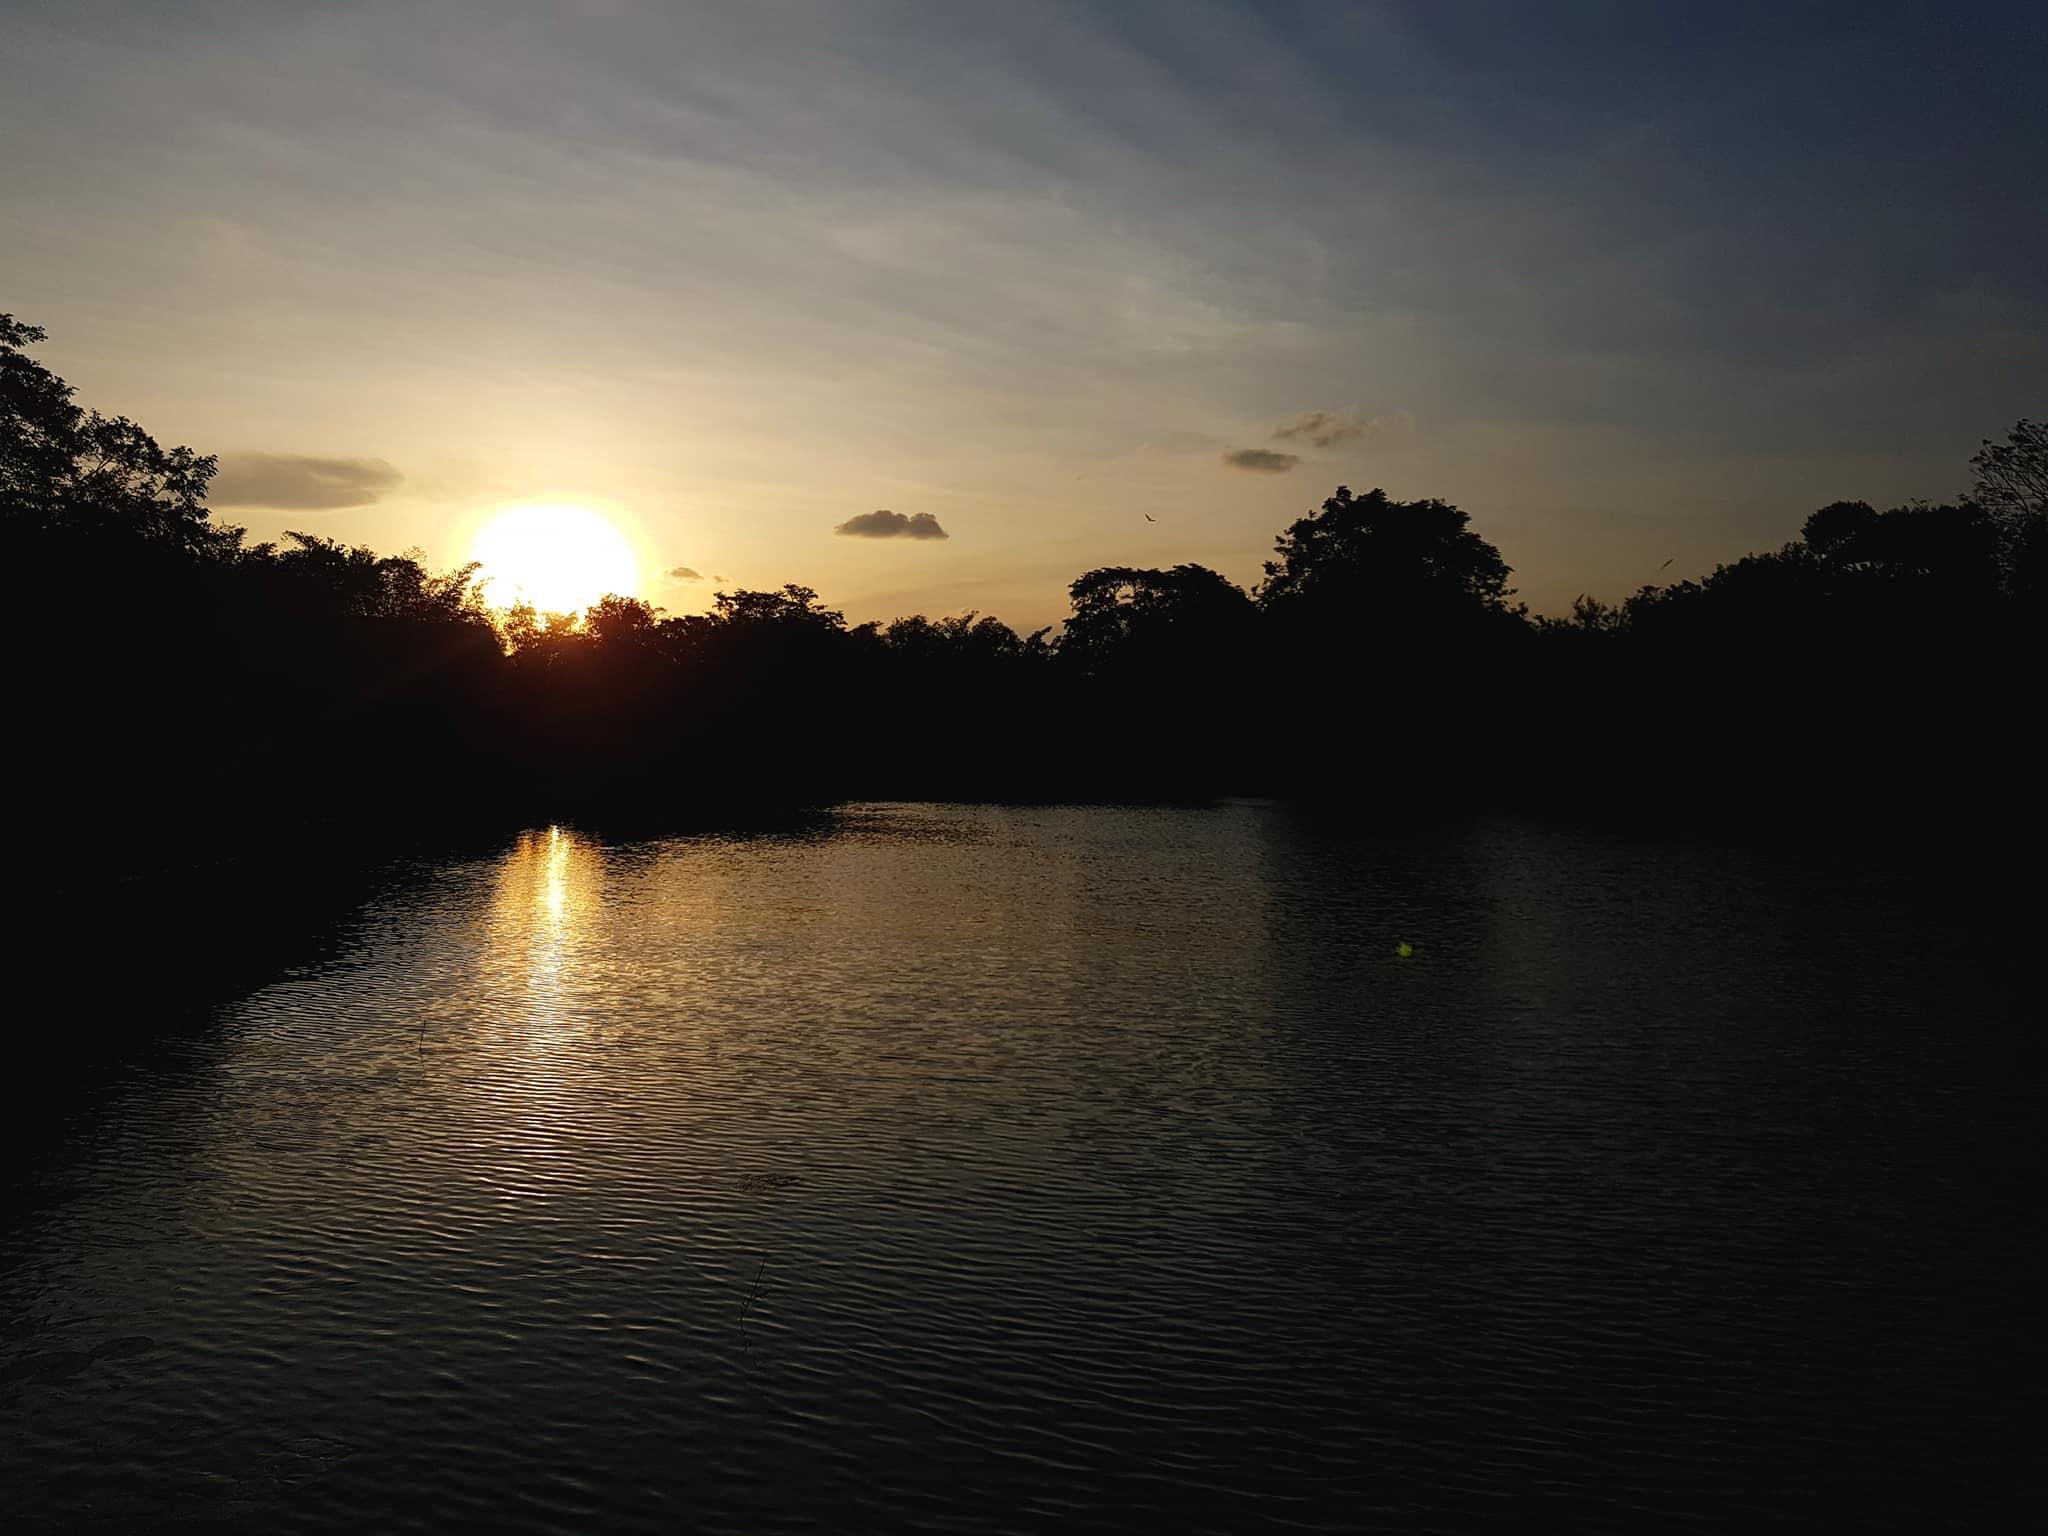 invite-to-paradise-sri-lanka-maldives-holiday-honeymoon-specialists-customer-guest-feedback-zane-lisa-butcher-jetwing-vil-uyana-hotel-sigiriya-cultural-triangle-lake.jpg